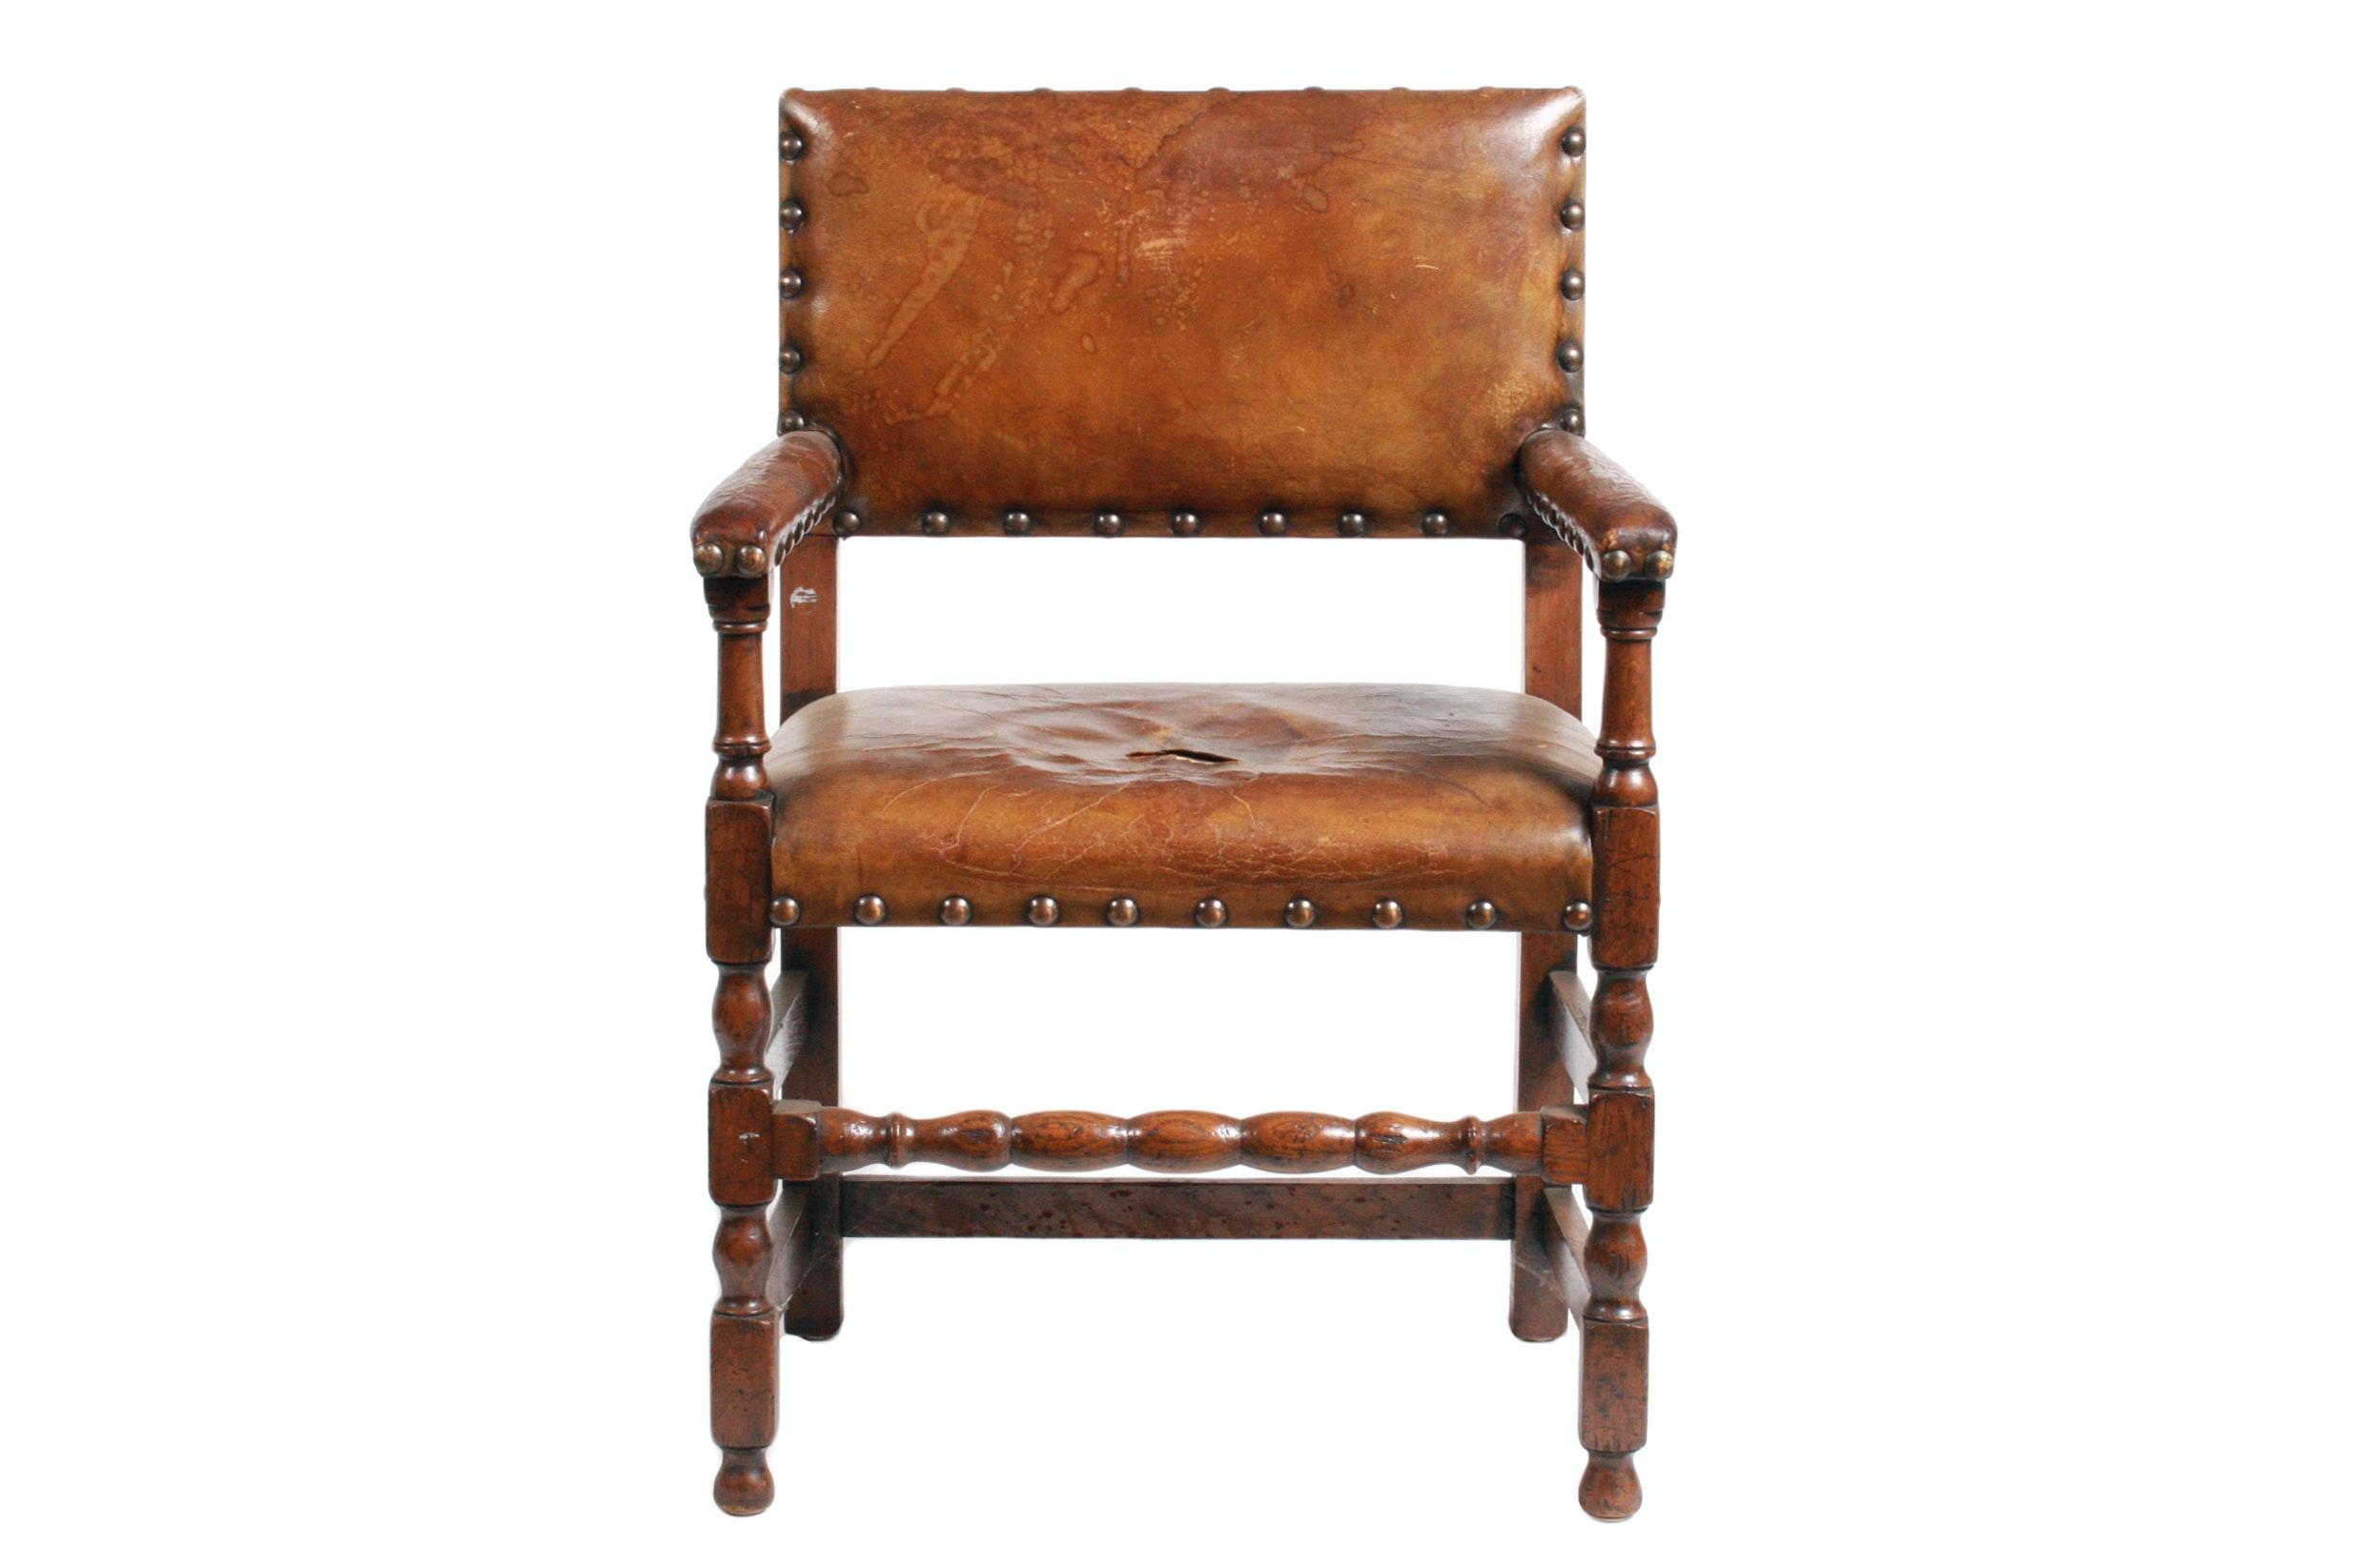 Vintage Jacobean Revival Style Armchair